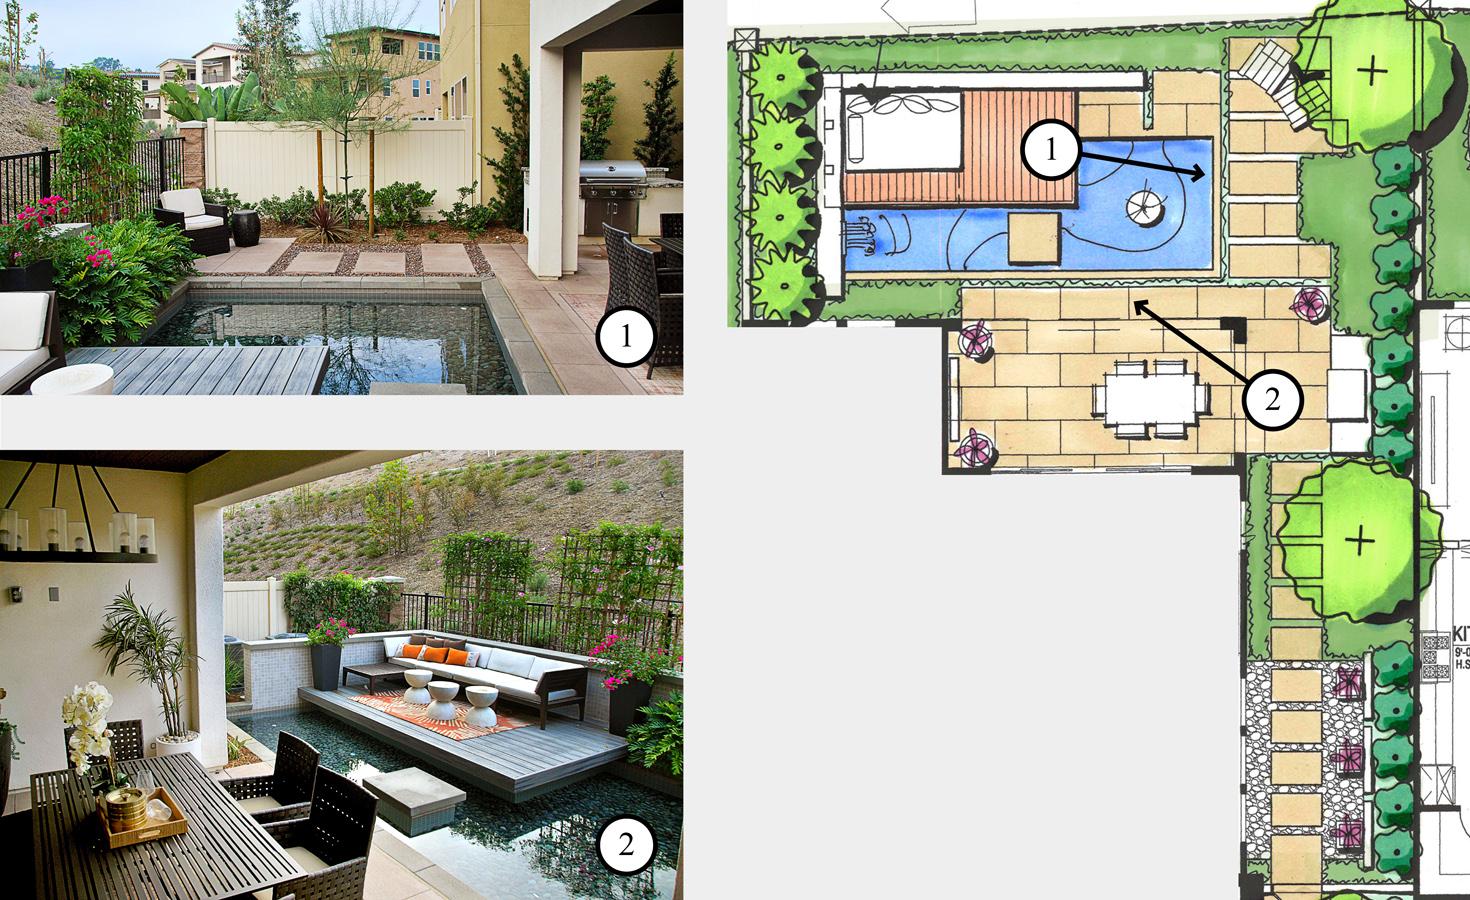 South-Pointe-Model-Homes-2-Web-2-15-18-1